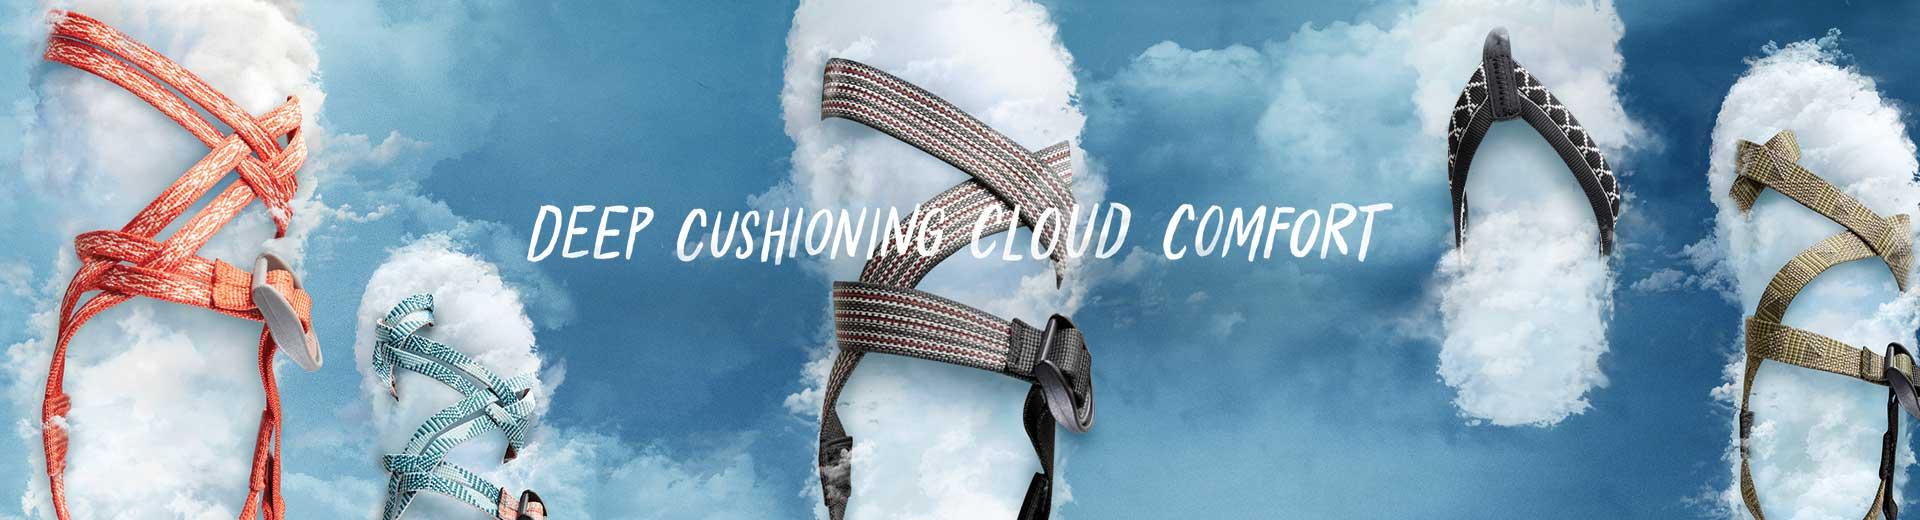 Deep Cushioning Cloud Comfort